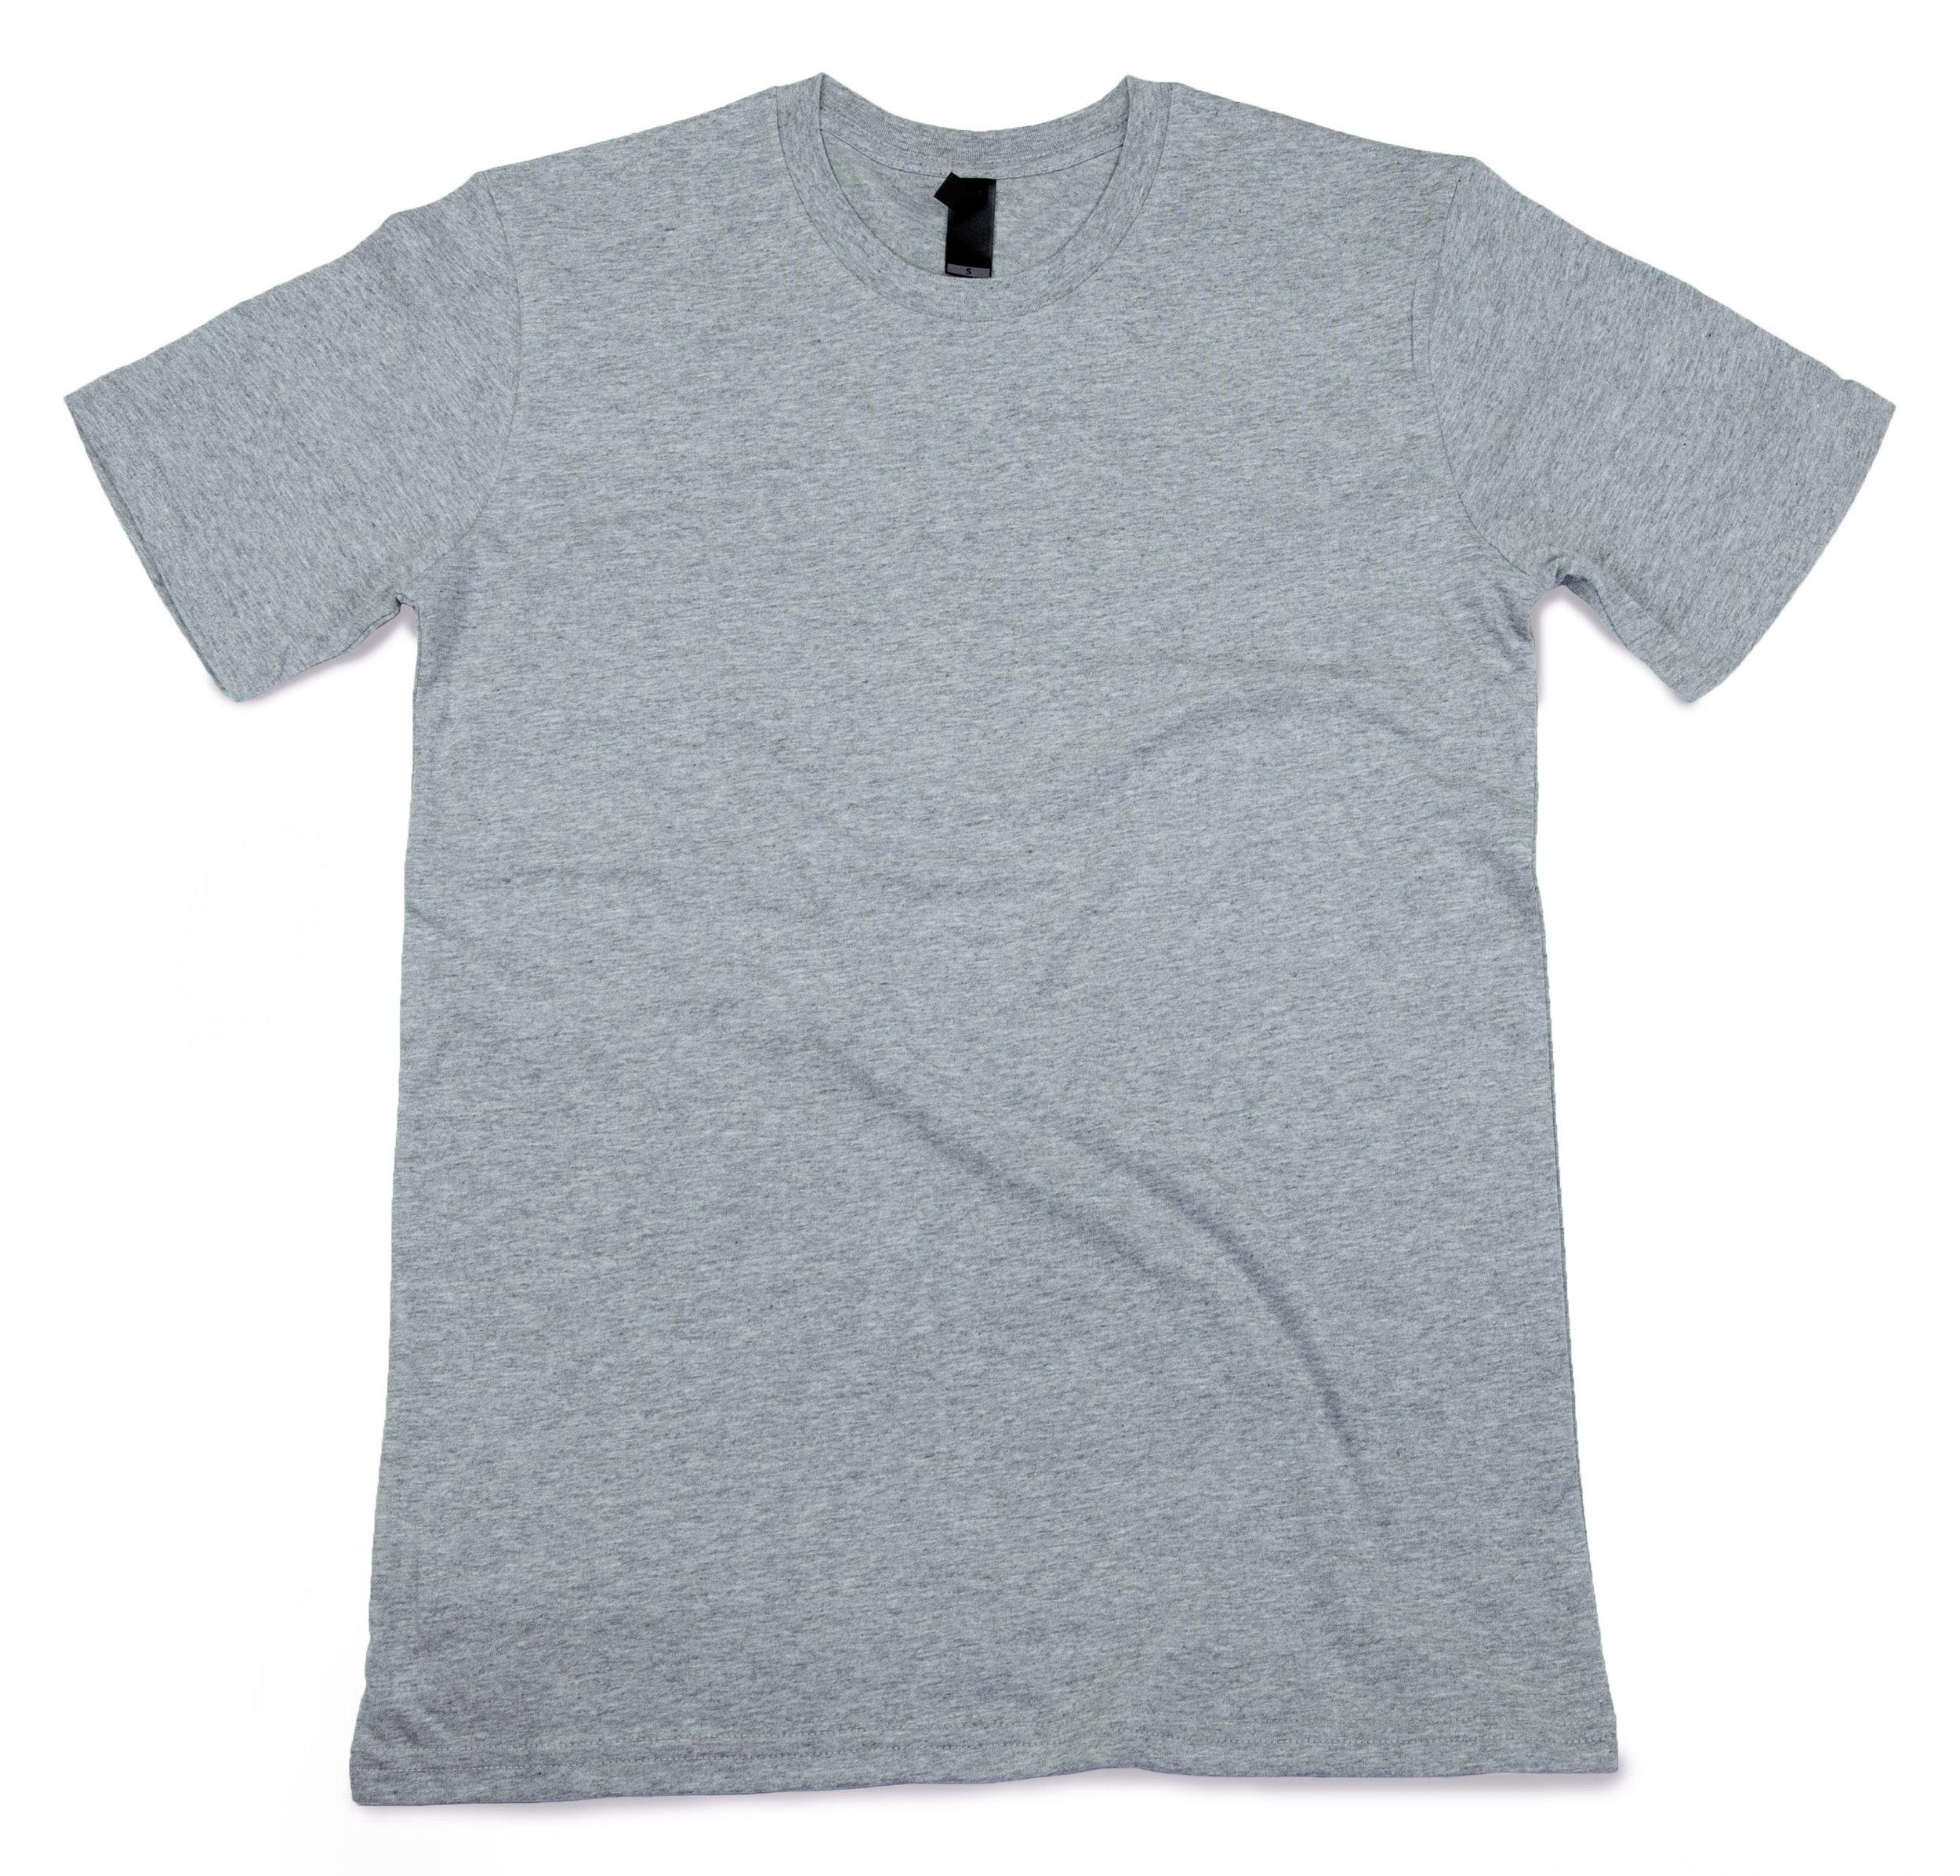 M2 - Men's Classic T-shirt